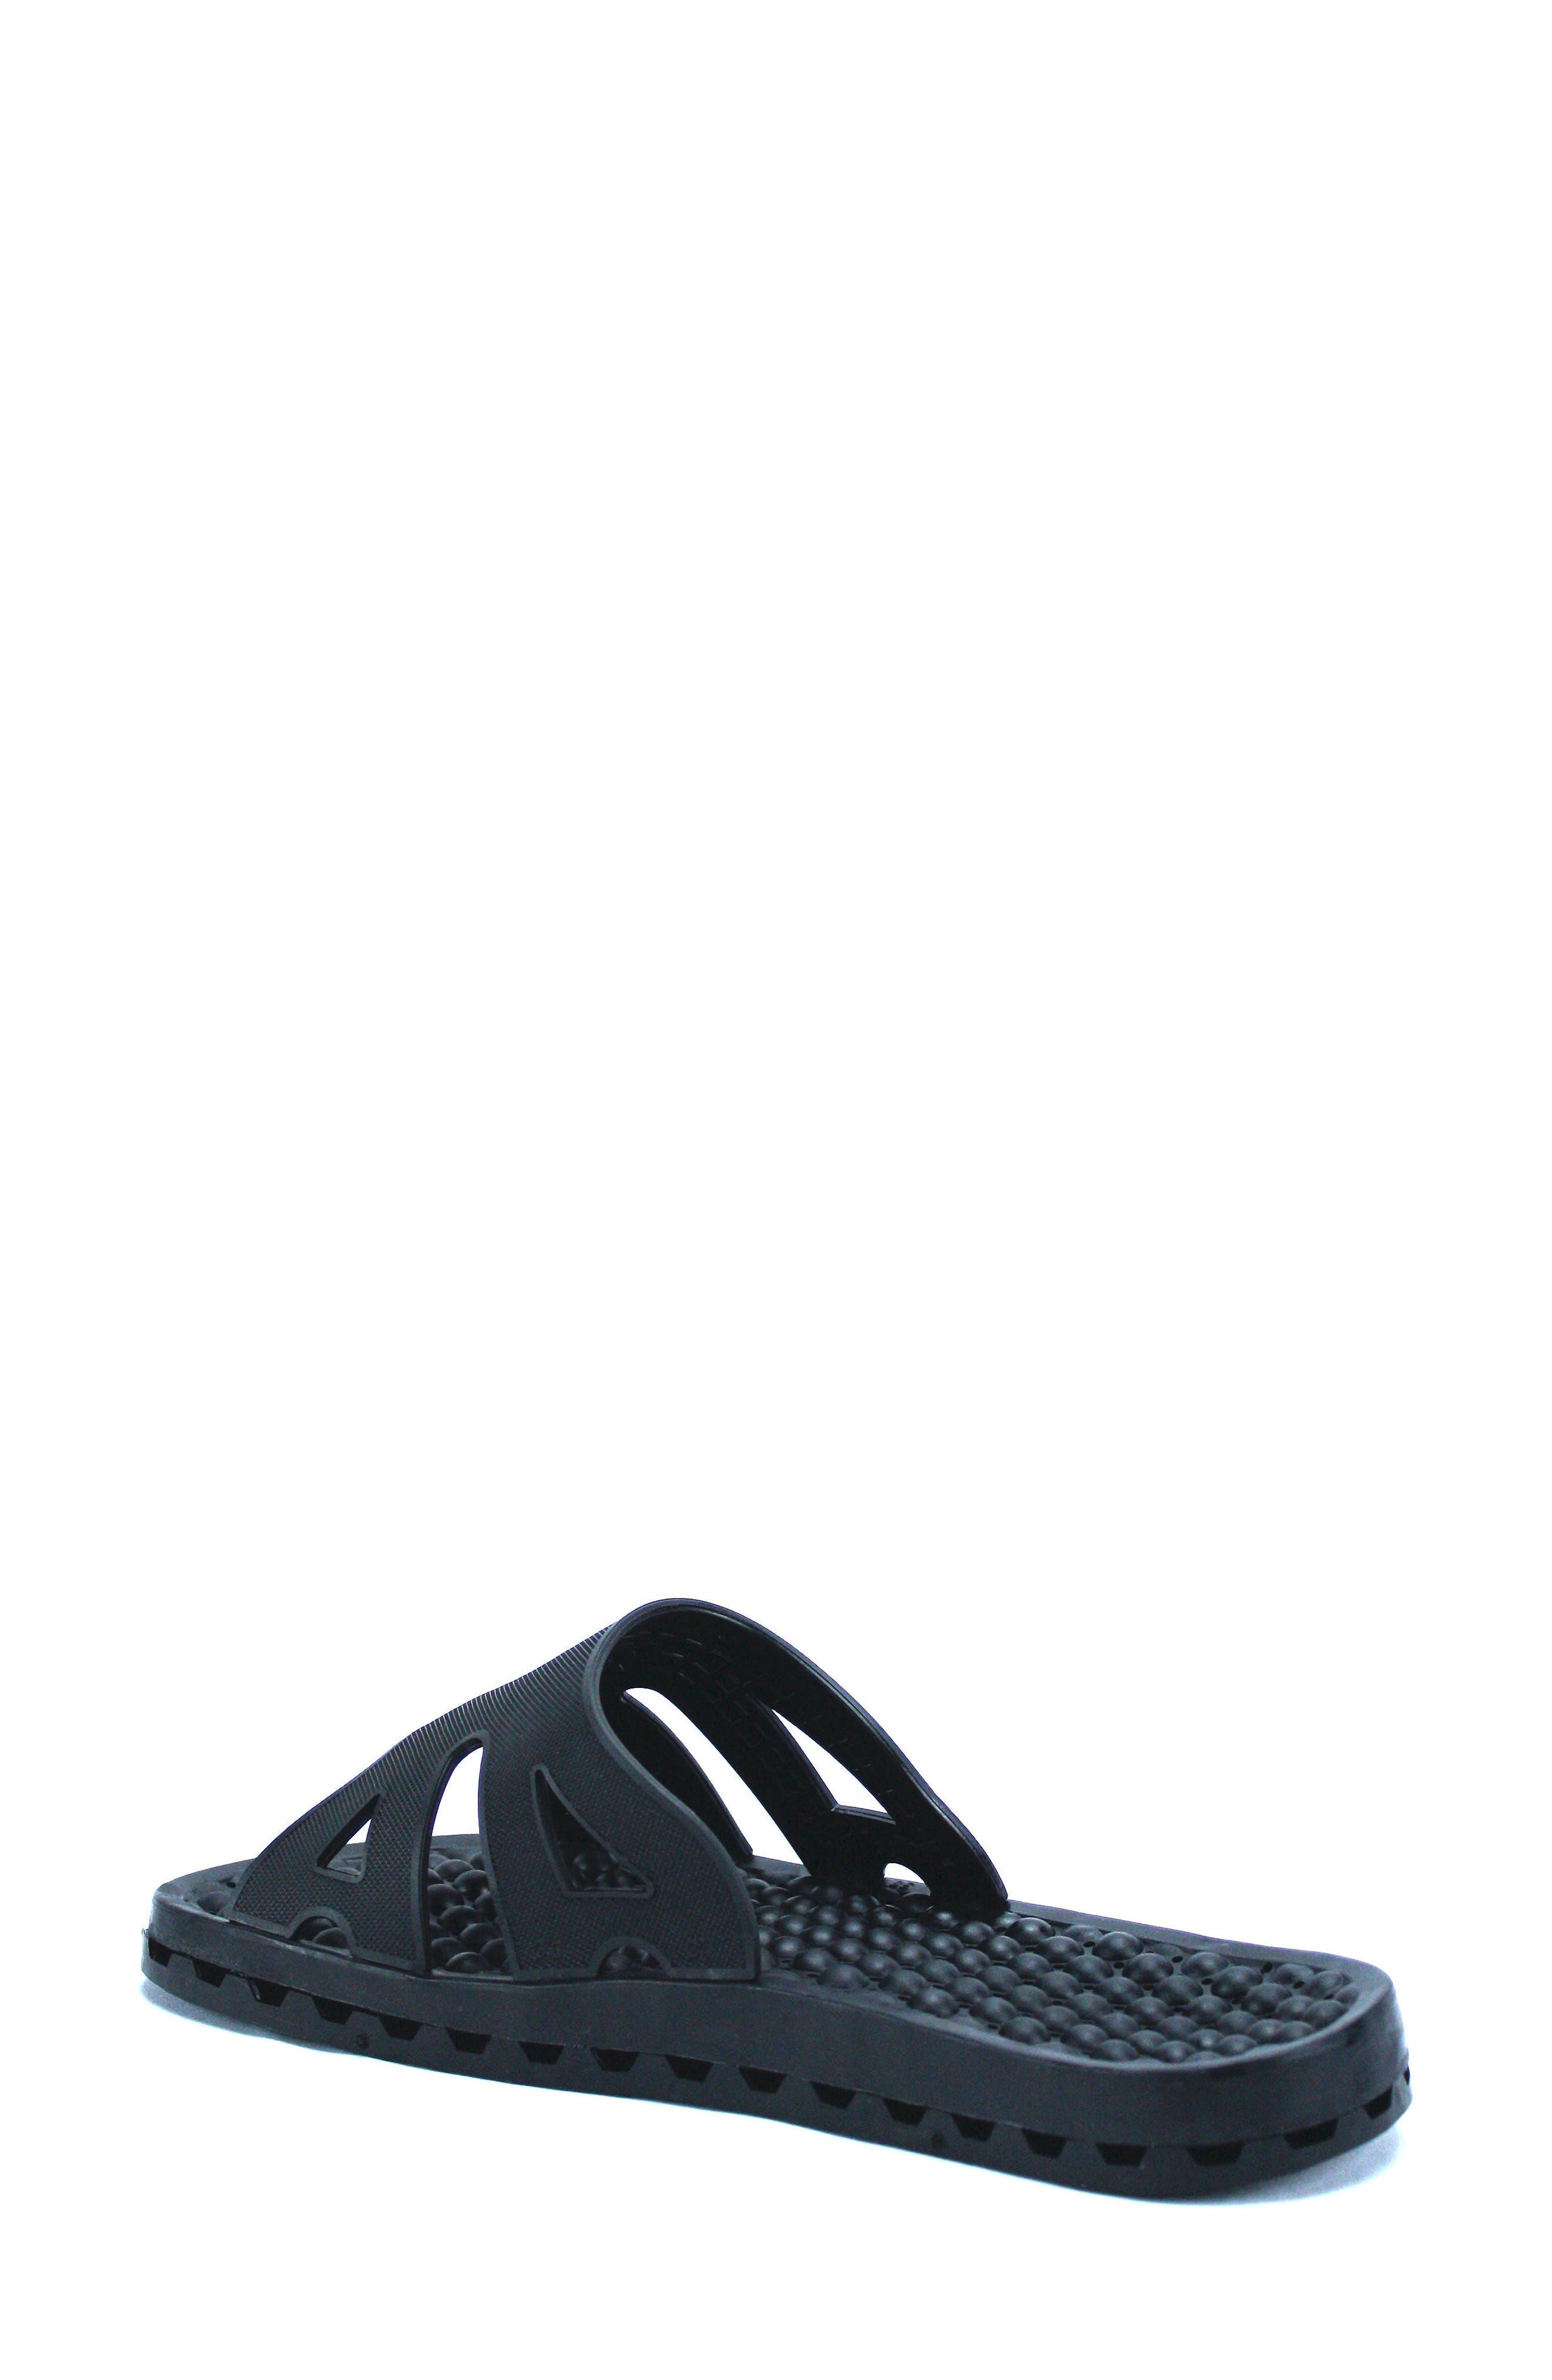 Regatta Ice Slide Sandal,                             Alternate thumbnail 2, color,                             SOLID BLACK